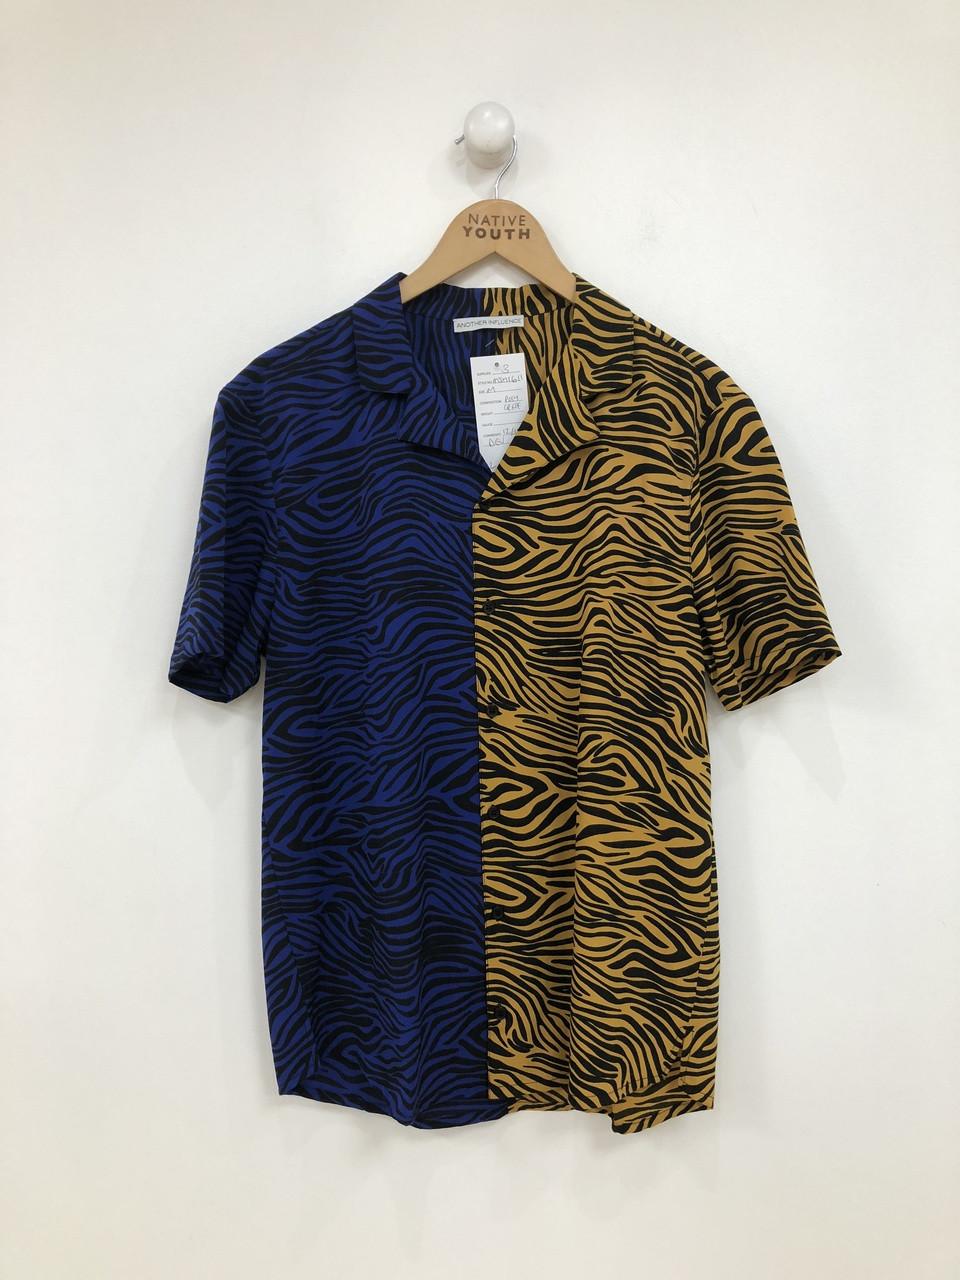 Spiced Zebra Print Long Sleeve Shirt